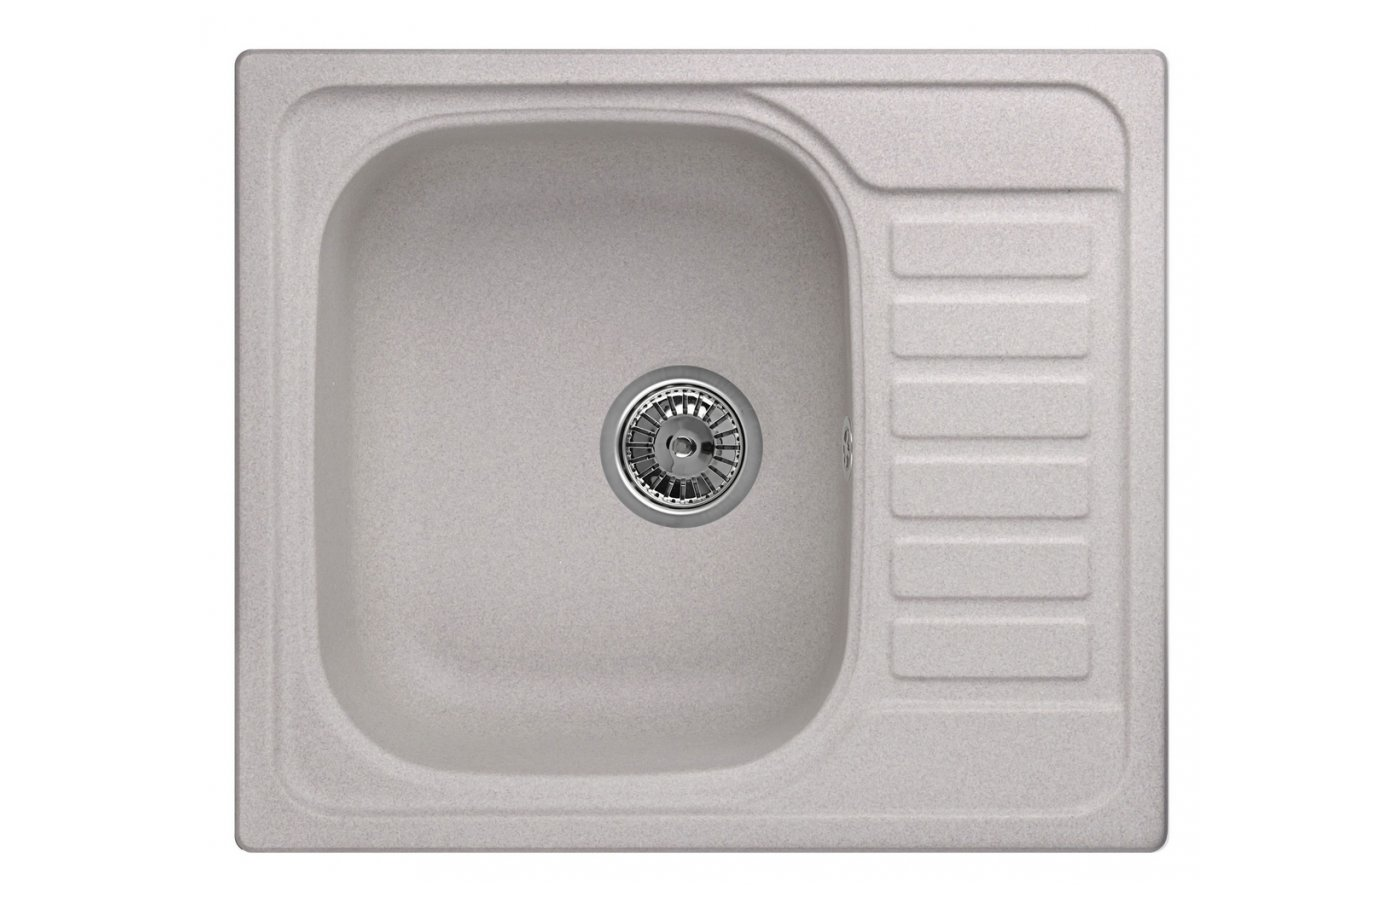 Кухонная мойка Weissgauff QUADRO 575 Eco Granit серый шелк